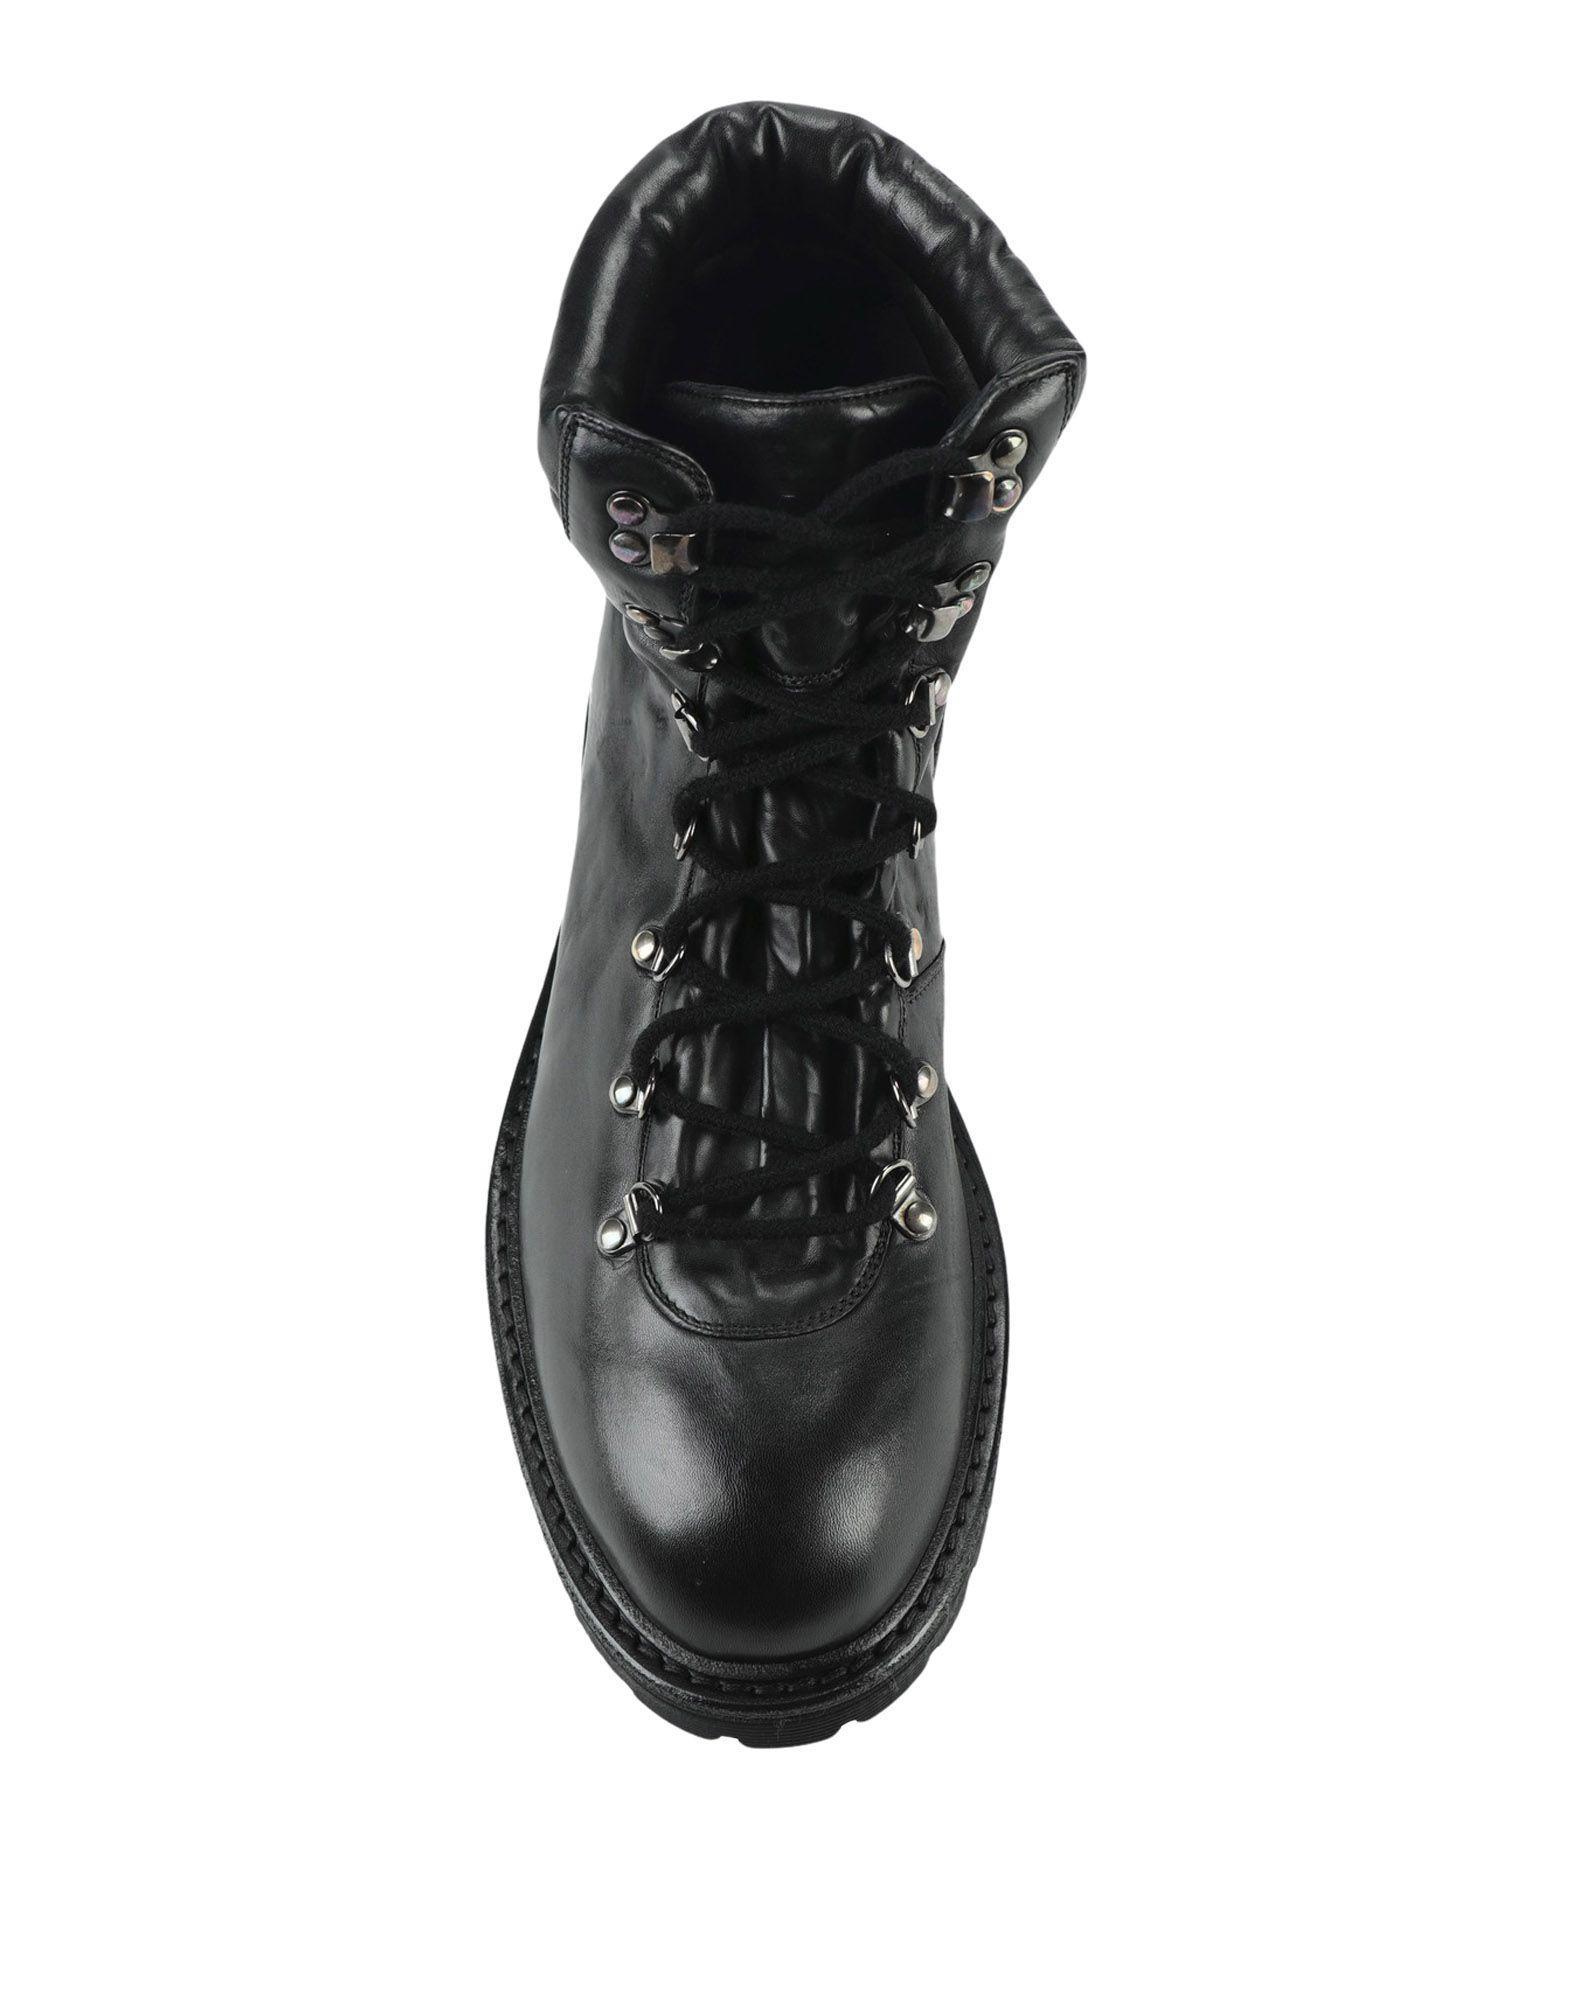 Botines de caña alta Raparo de Caucho de color Negro para hombre